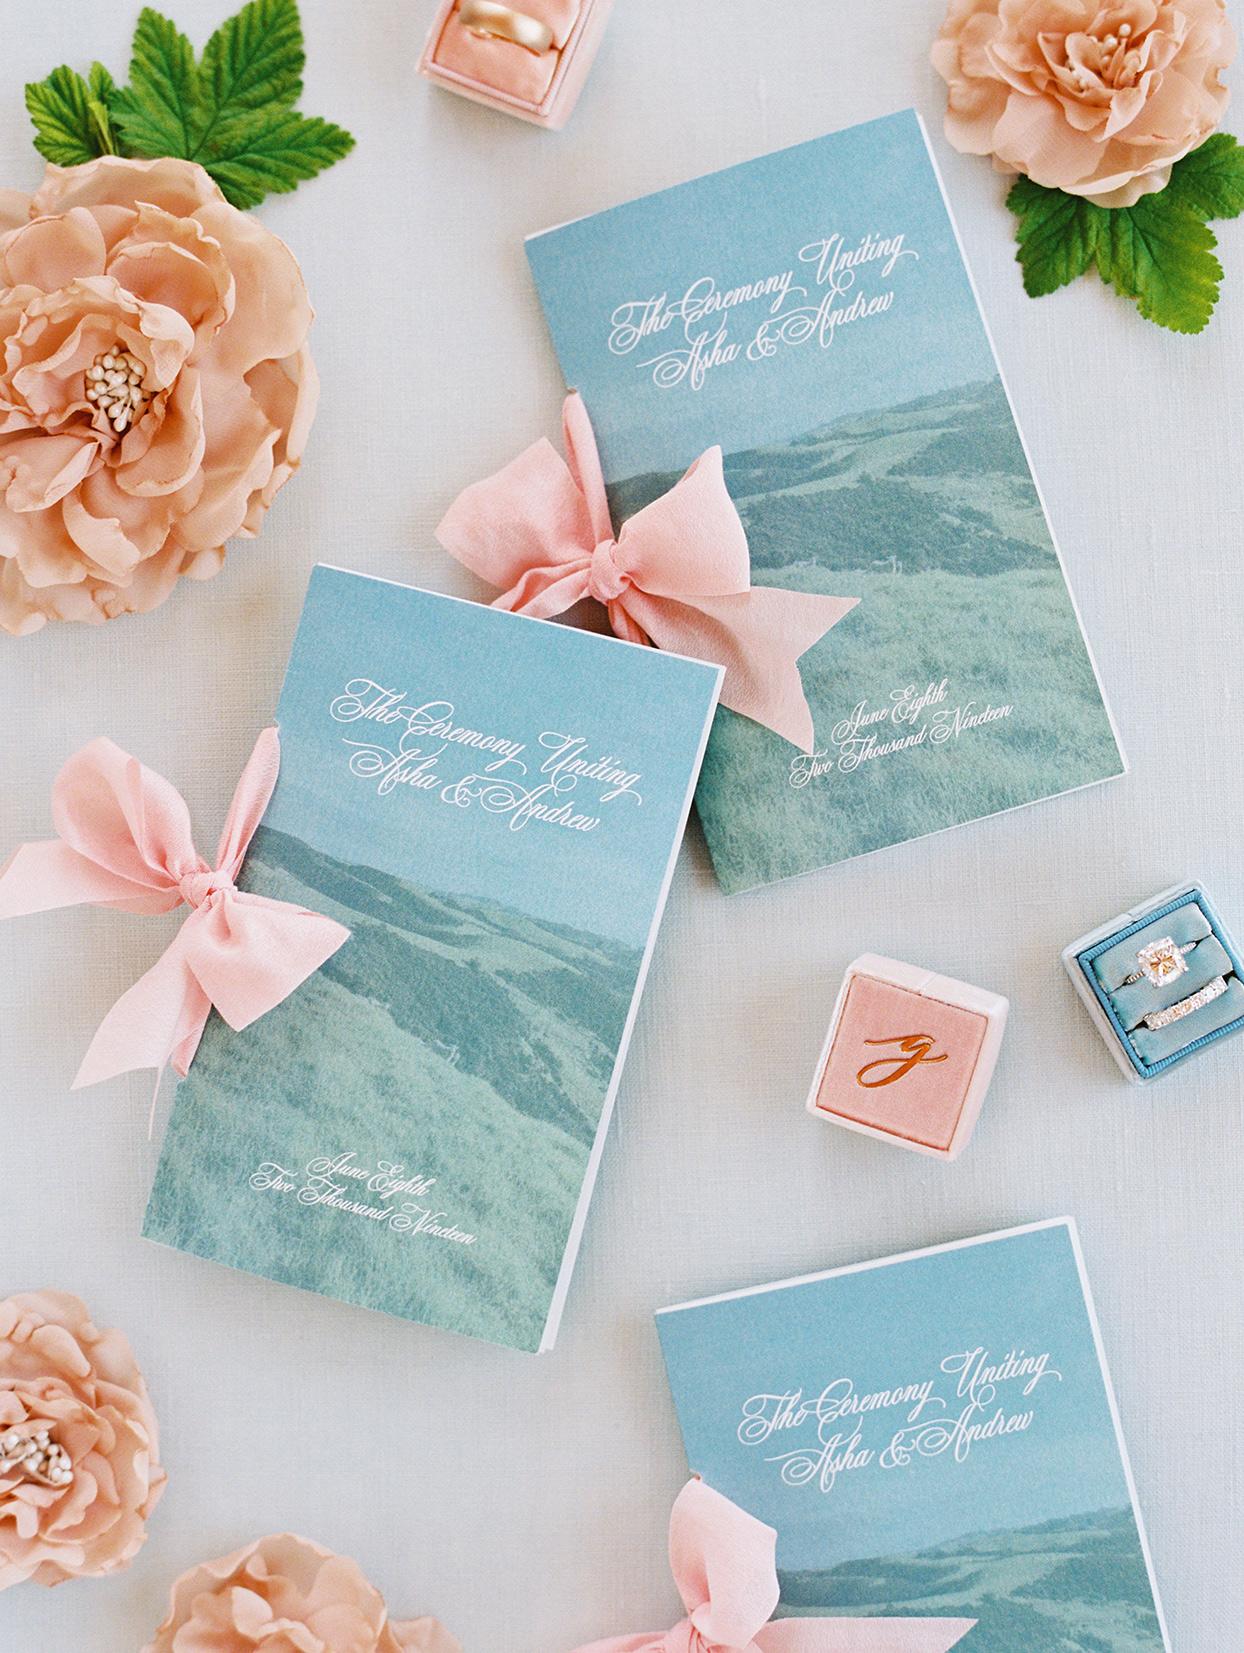 asha andrew wedding ceremony scenic programs with pink bows